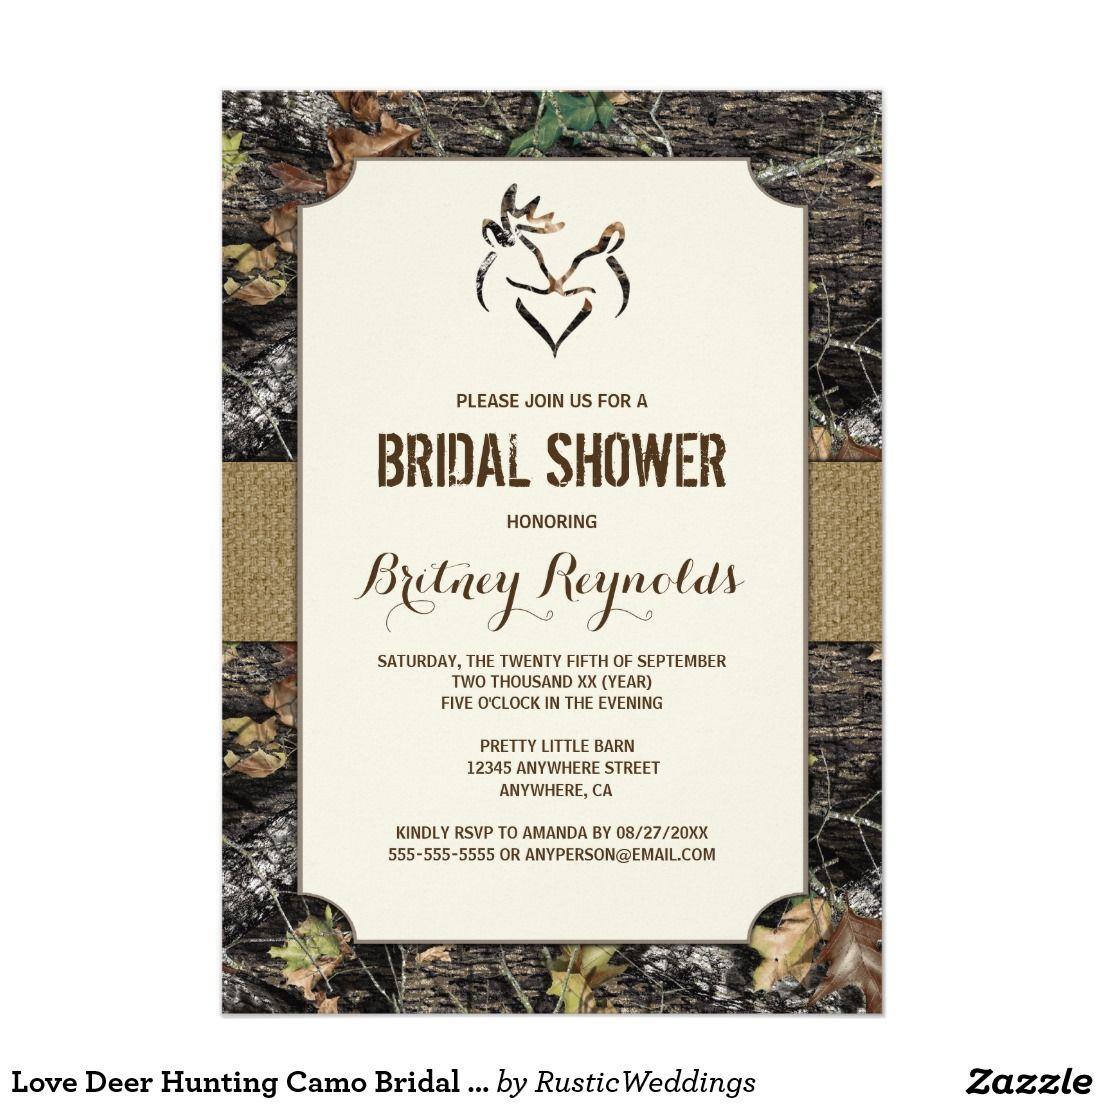 Love Deer Hunting Camo Bridal Shower Invitations | Jamie and Sam\'s ...